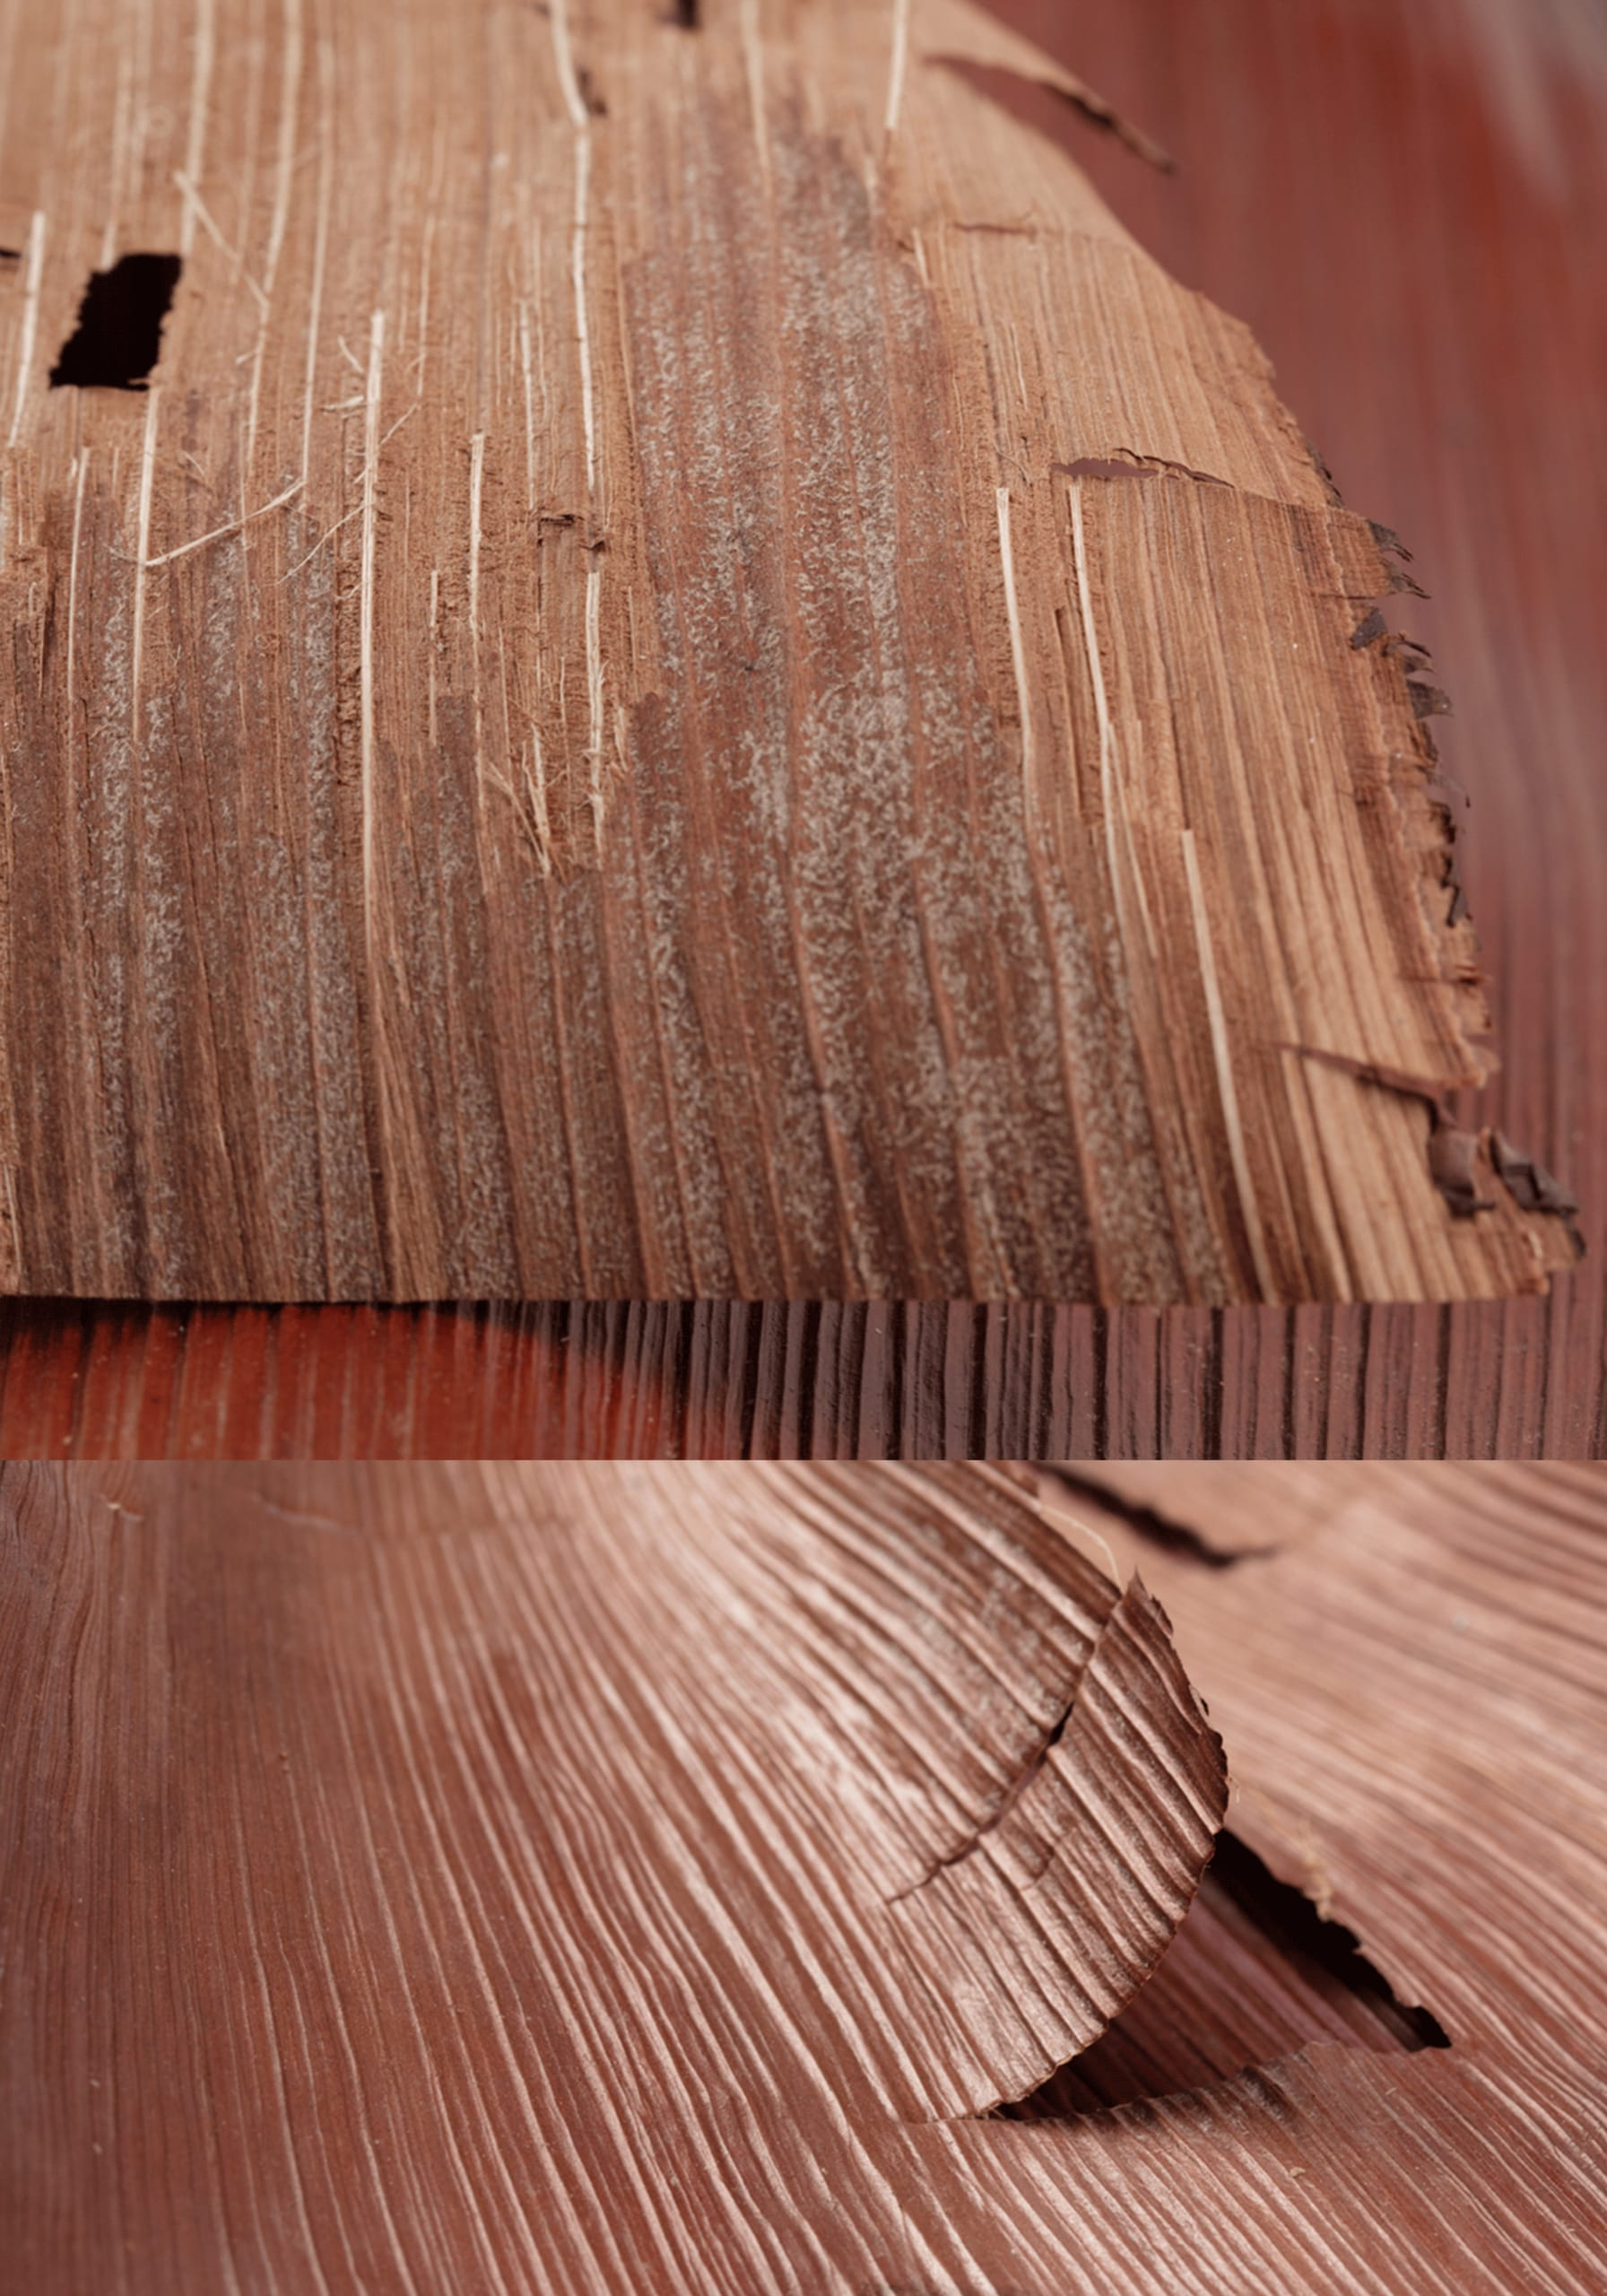 Fibrous, woody material